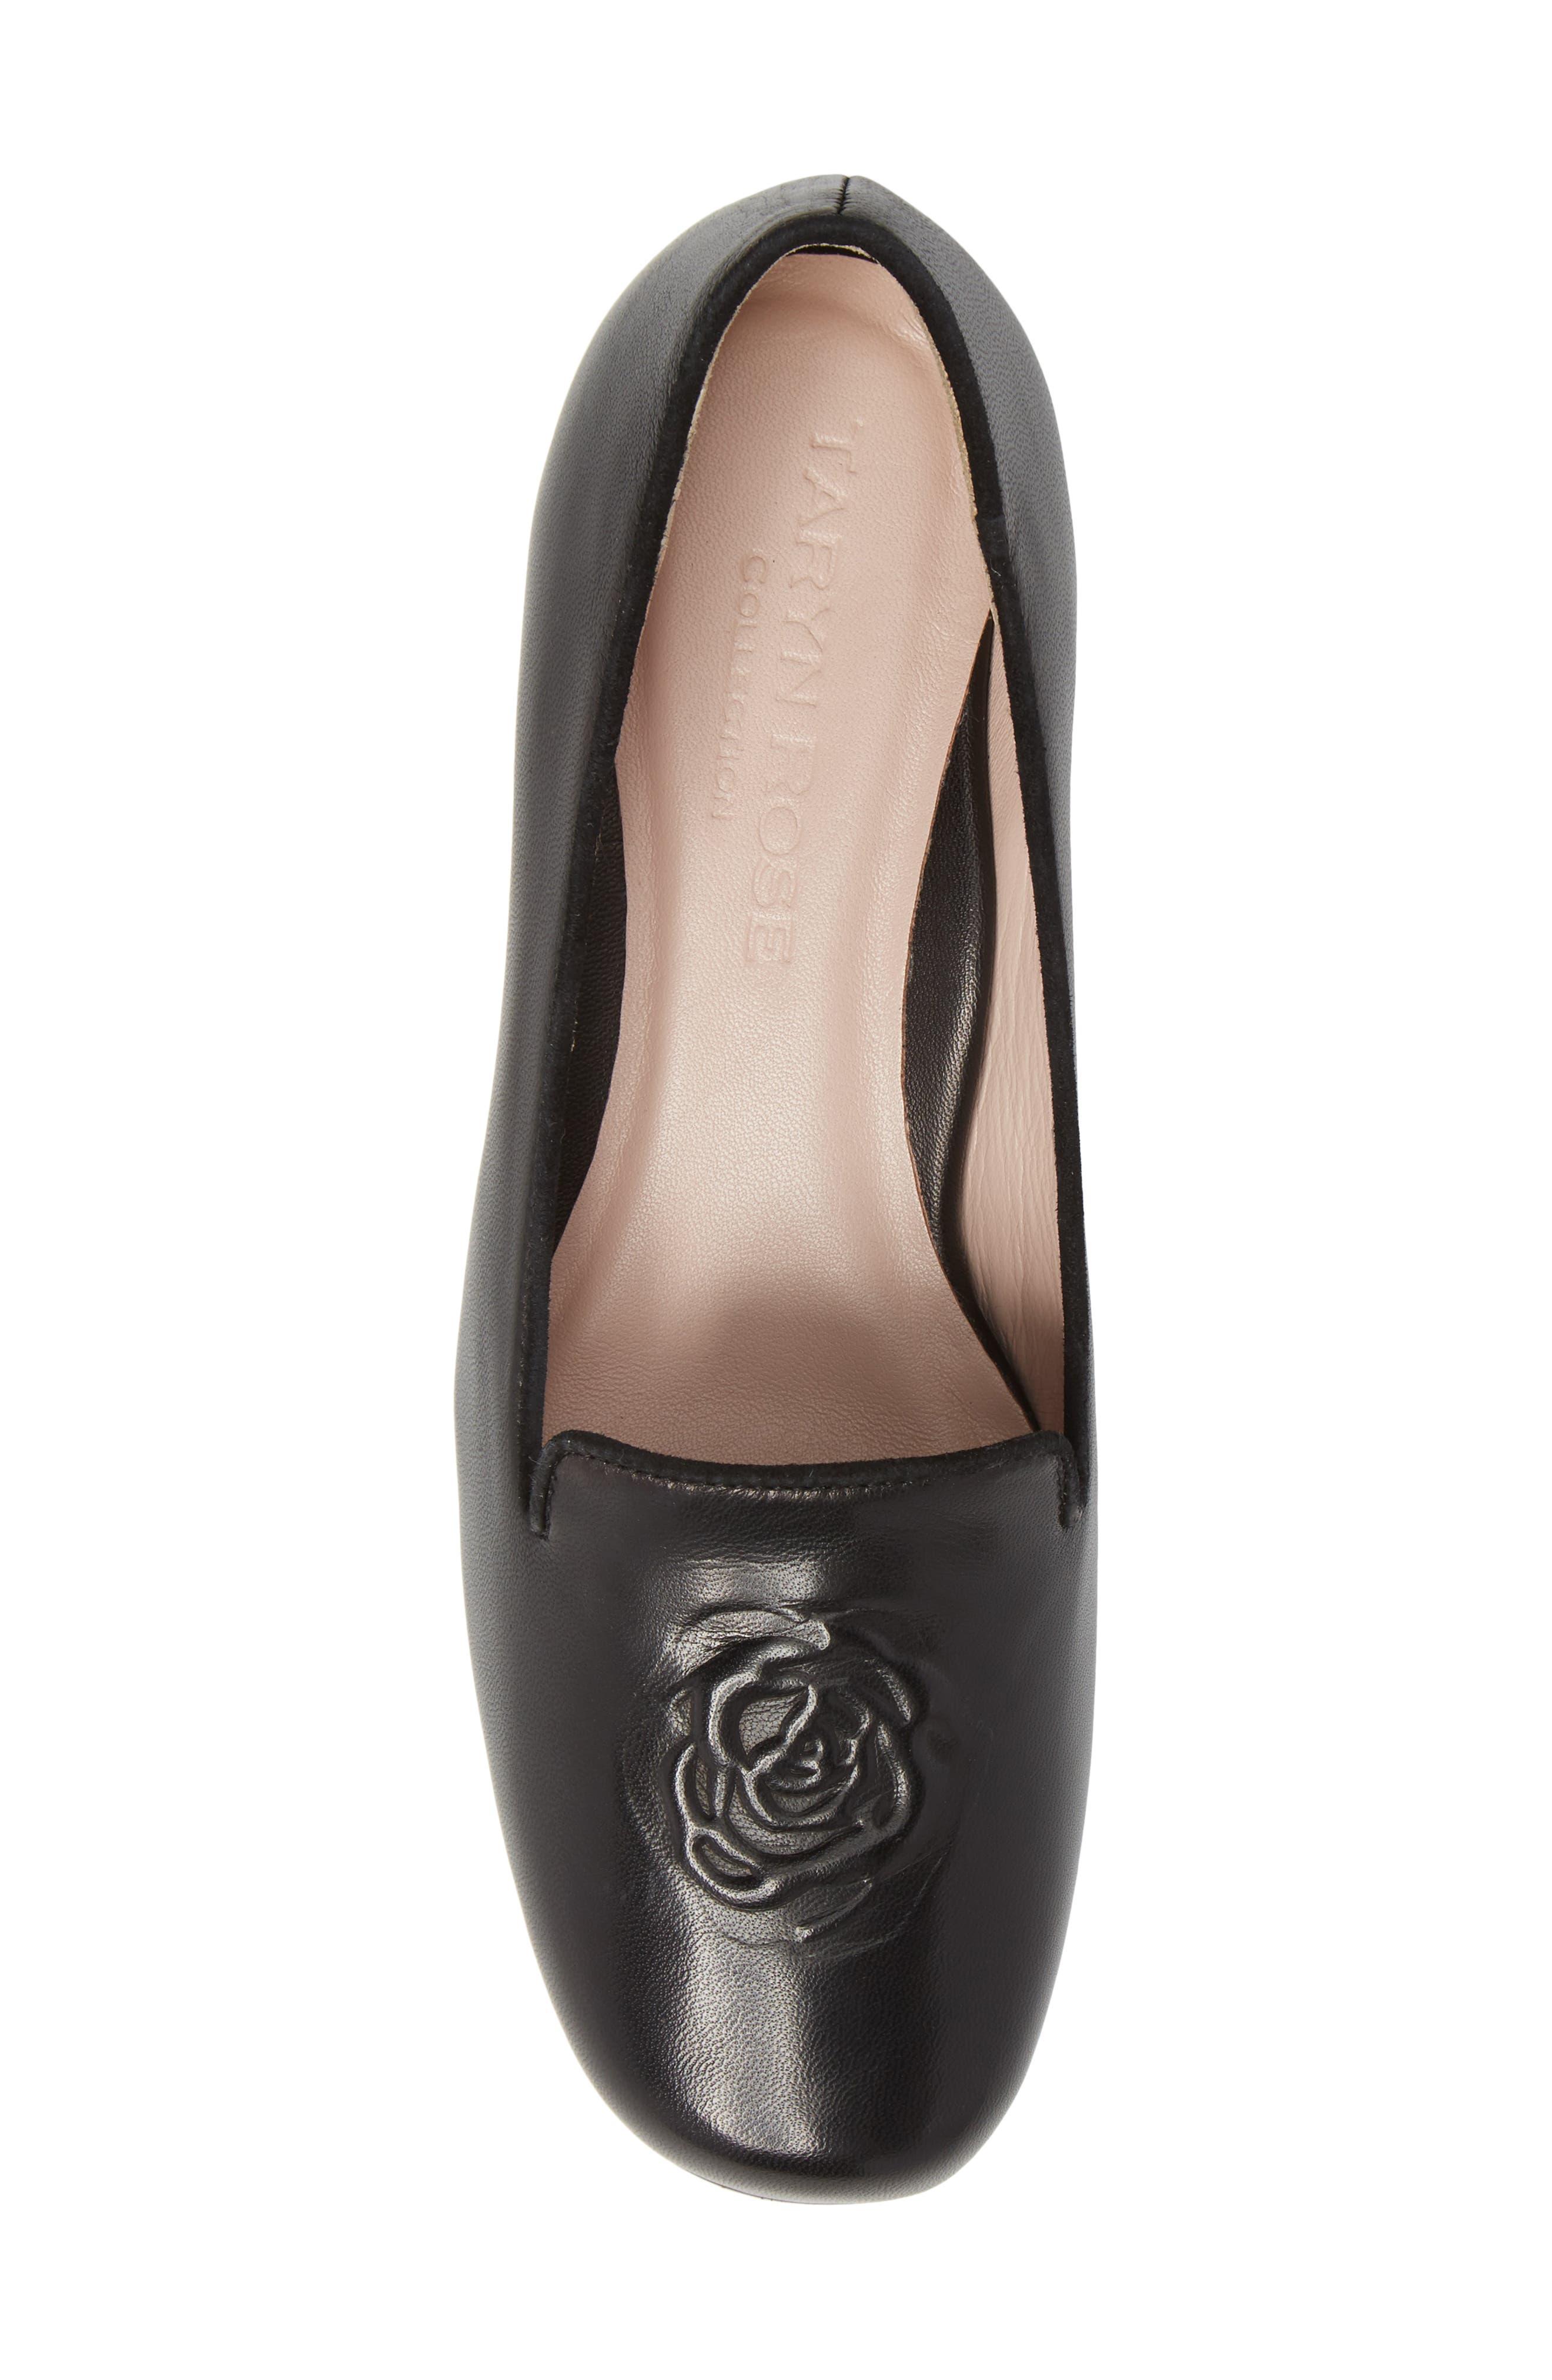 Taryn Rose Belissa Loafer,                             Alternate thumbnail 5, color,                             Black Leather